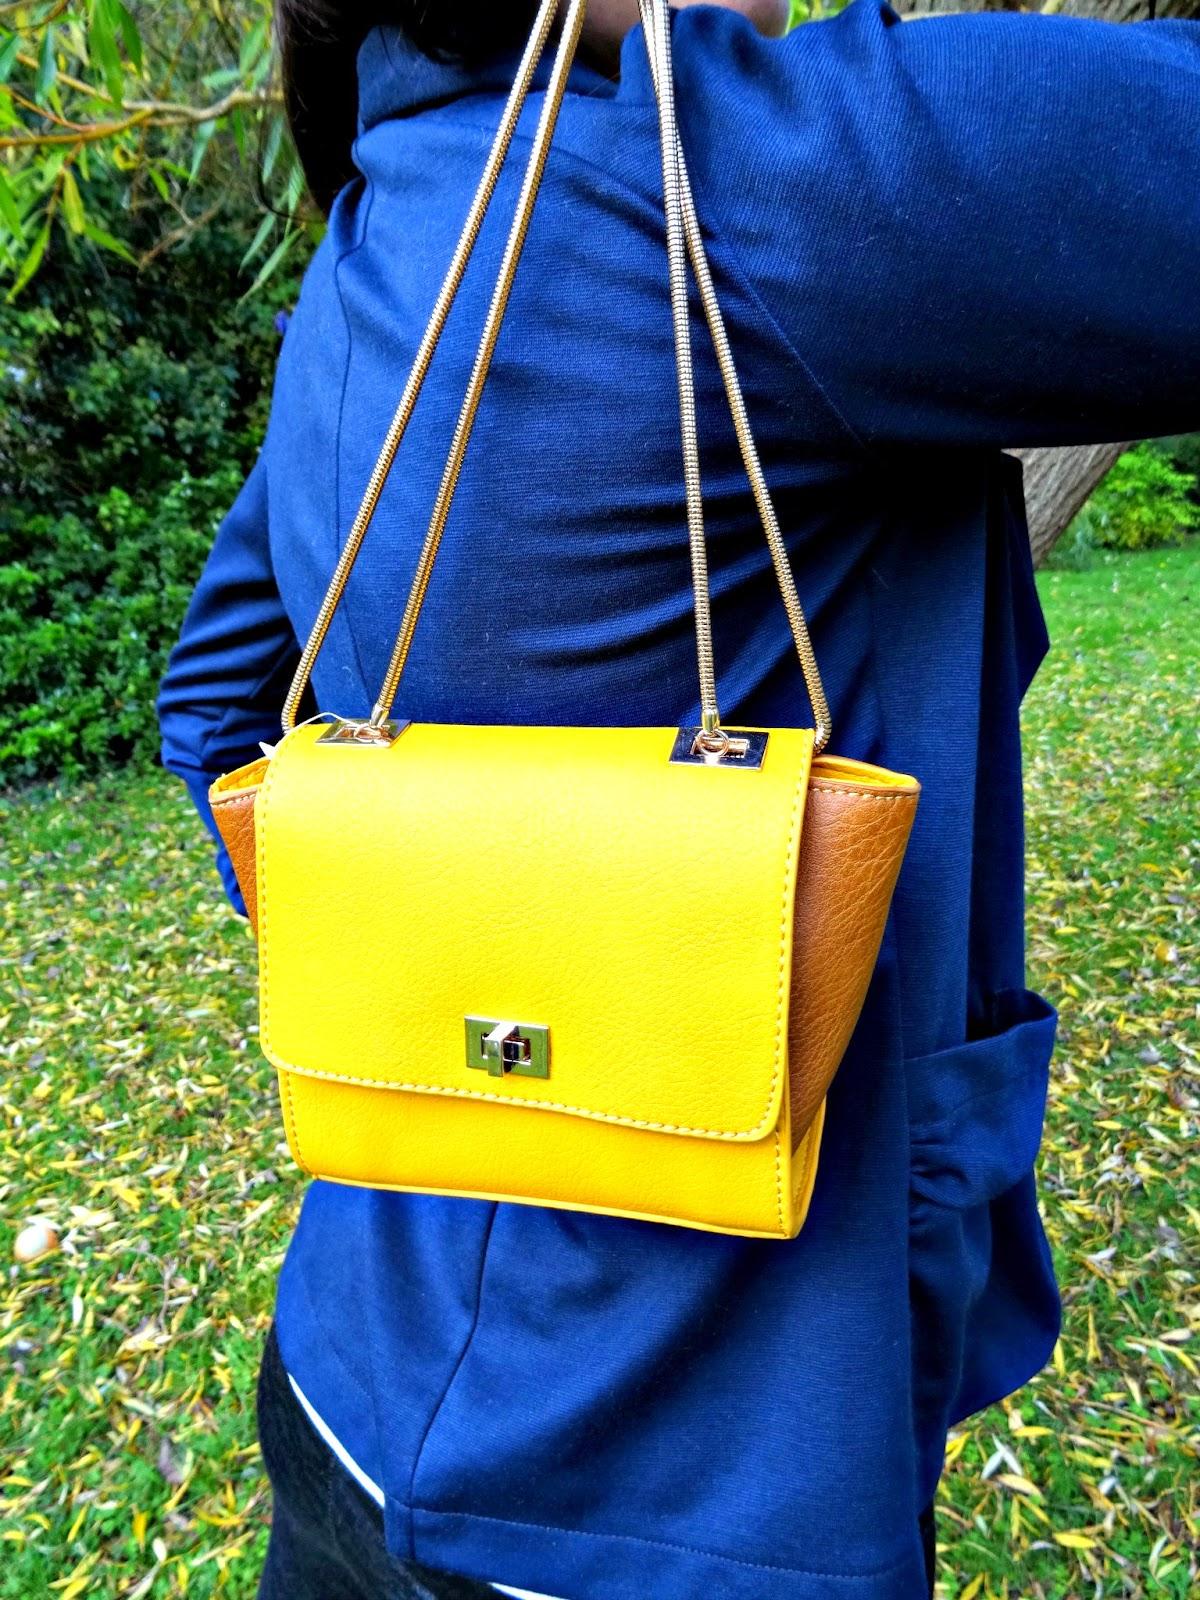 Autumn fashion ootd with mini handbag and blazer